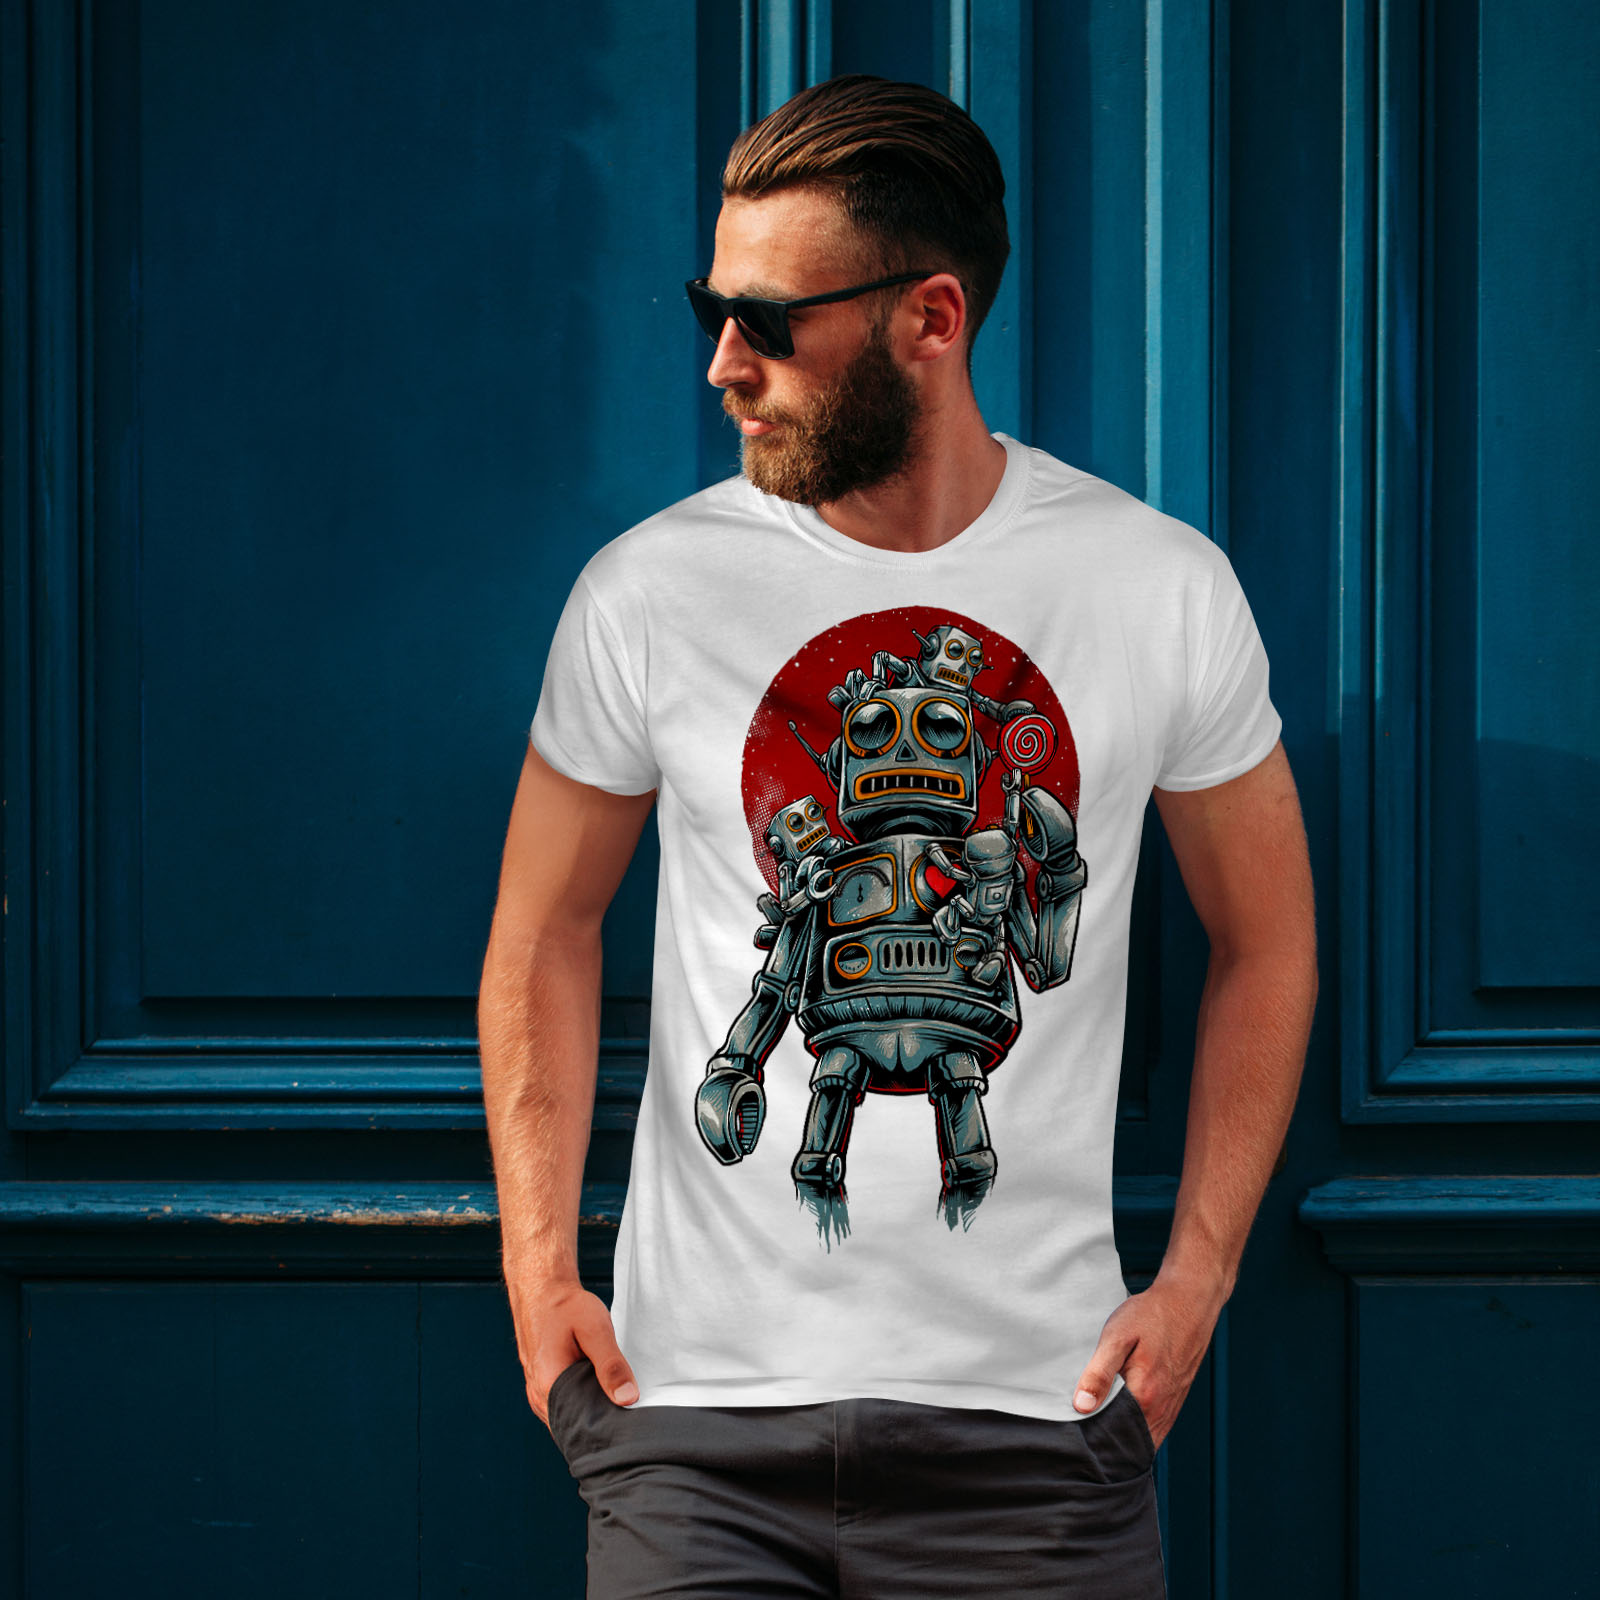 miniature 10 - Wellcoda Crazy Robot Mens T-shirt, Mechanical Graphic Design Printed Tee